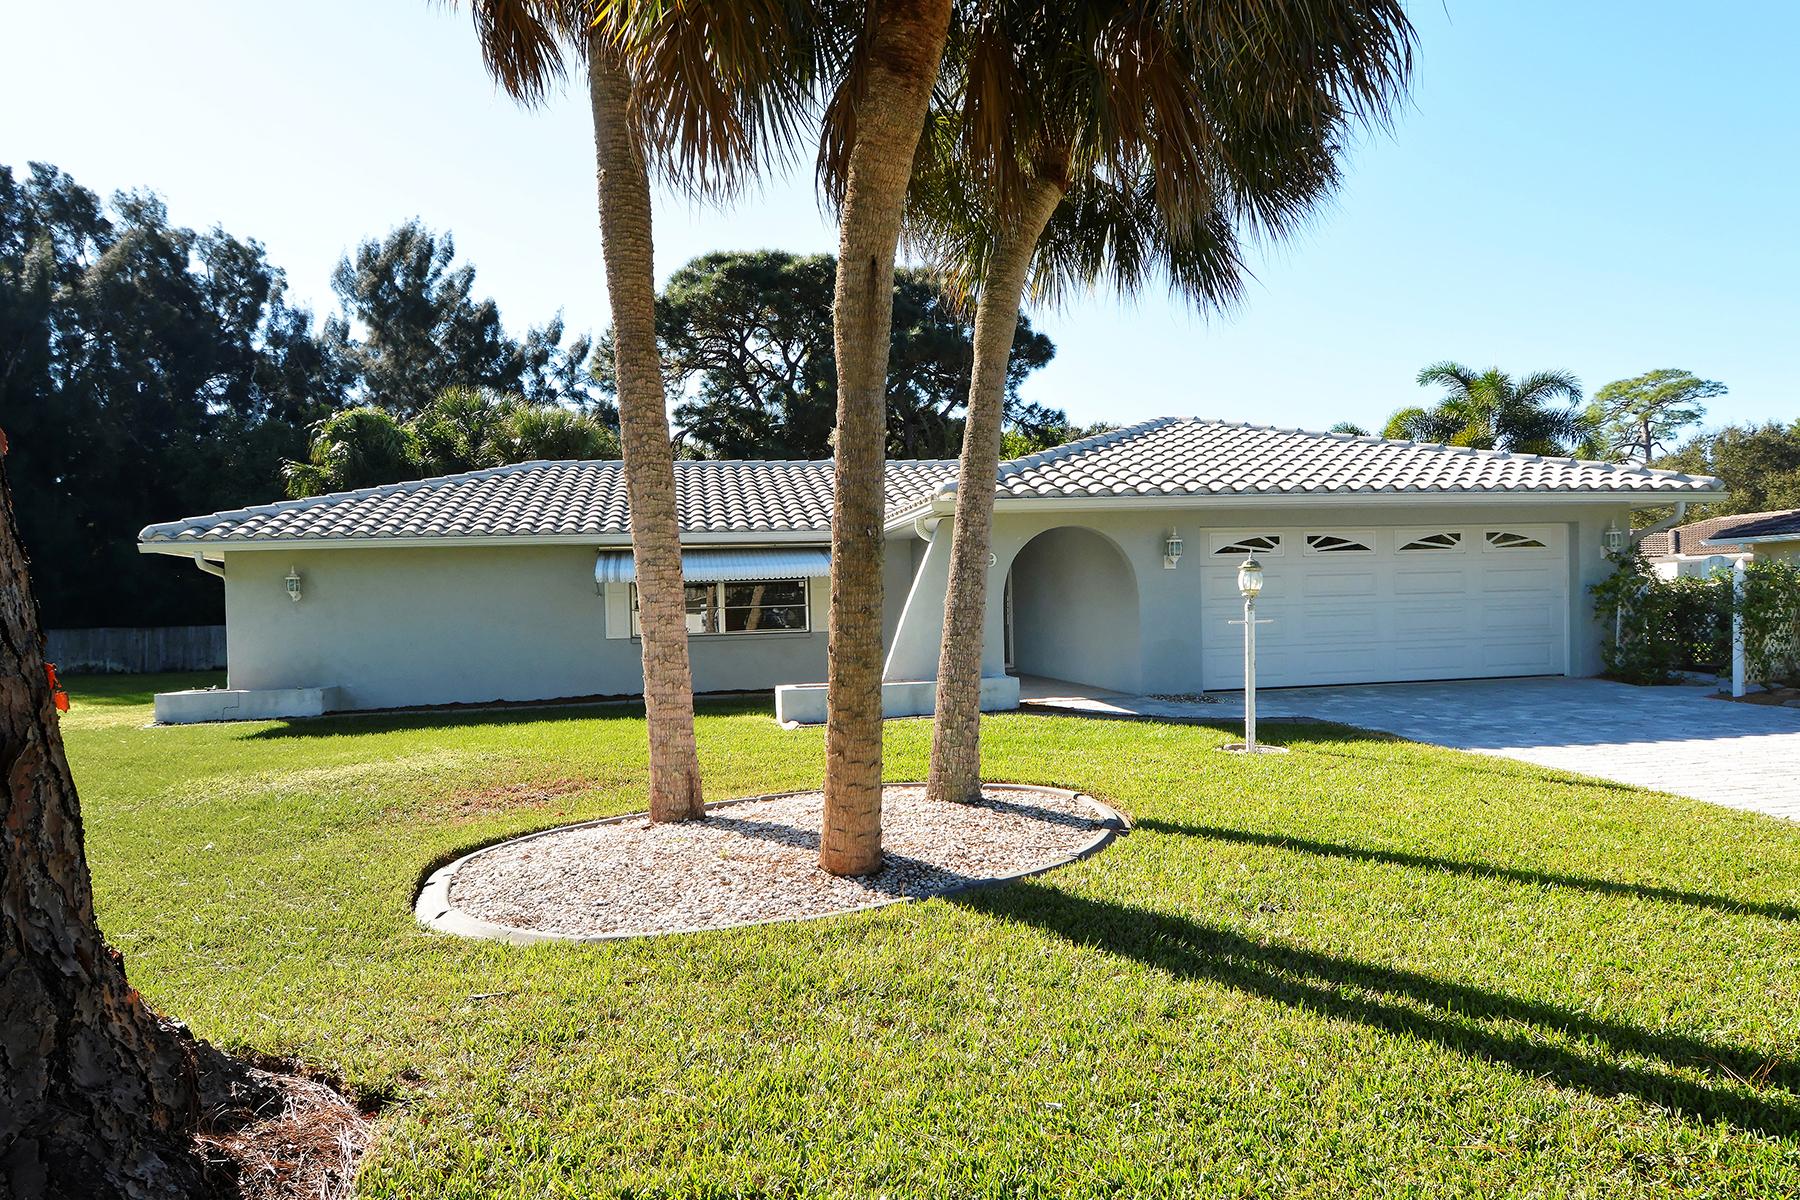 Single Family Home for Sale at NOKOMIS 209 Cavallini Dr Nokomis, Florida 34275 United States